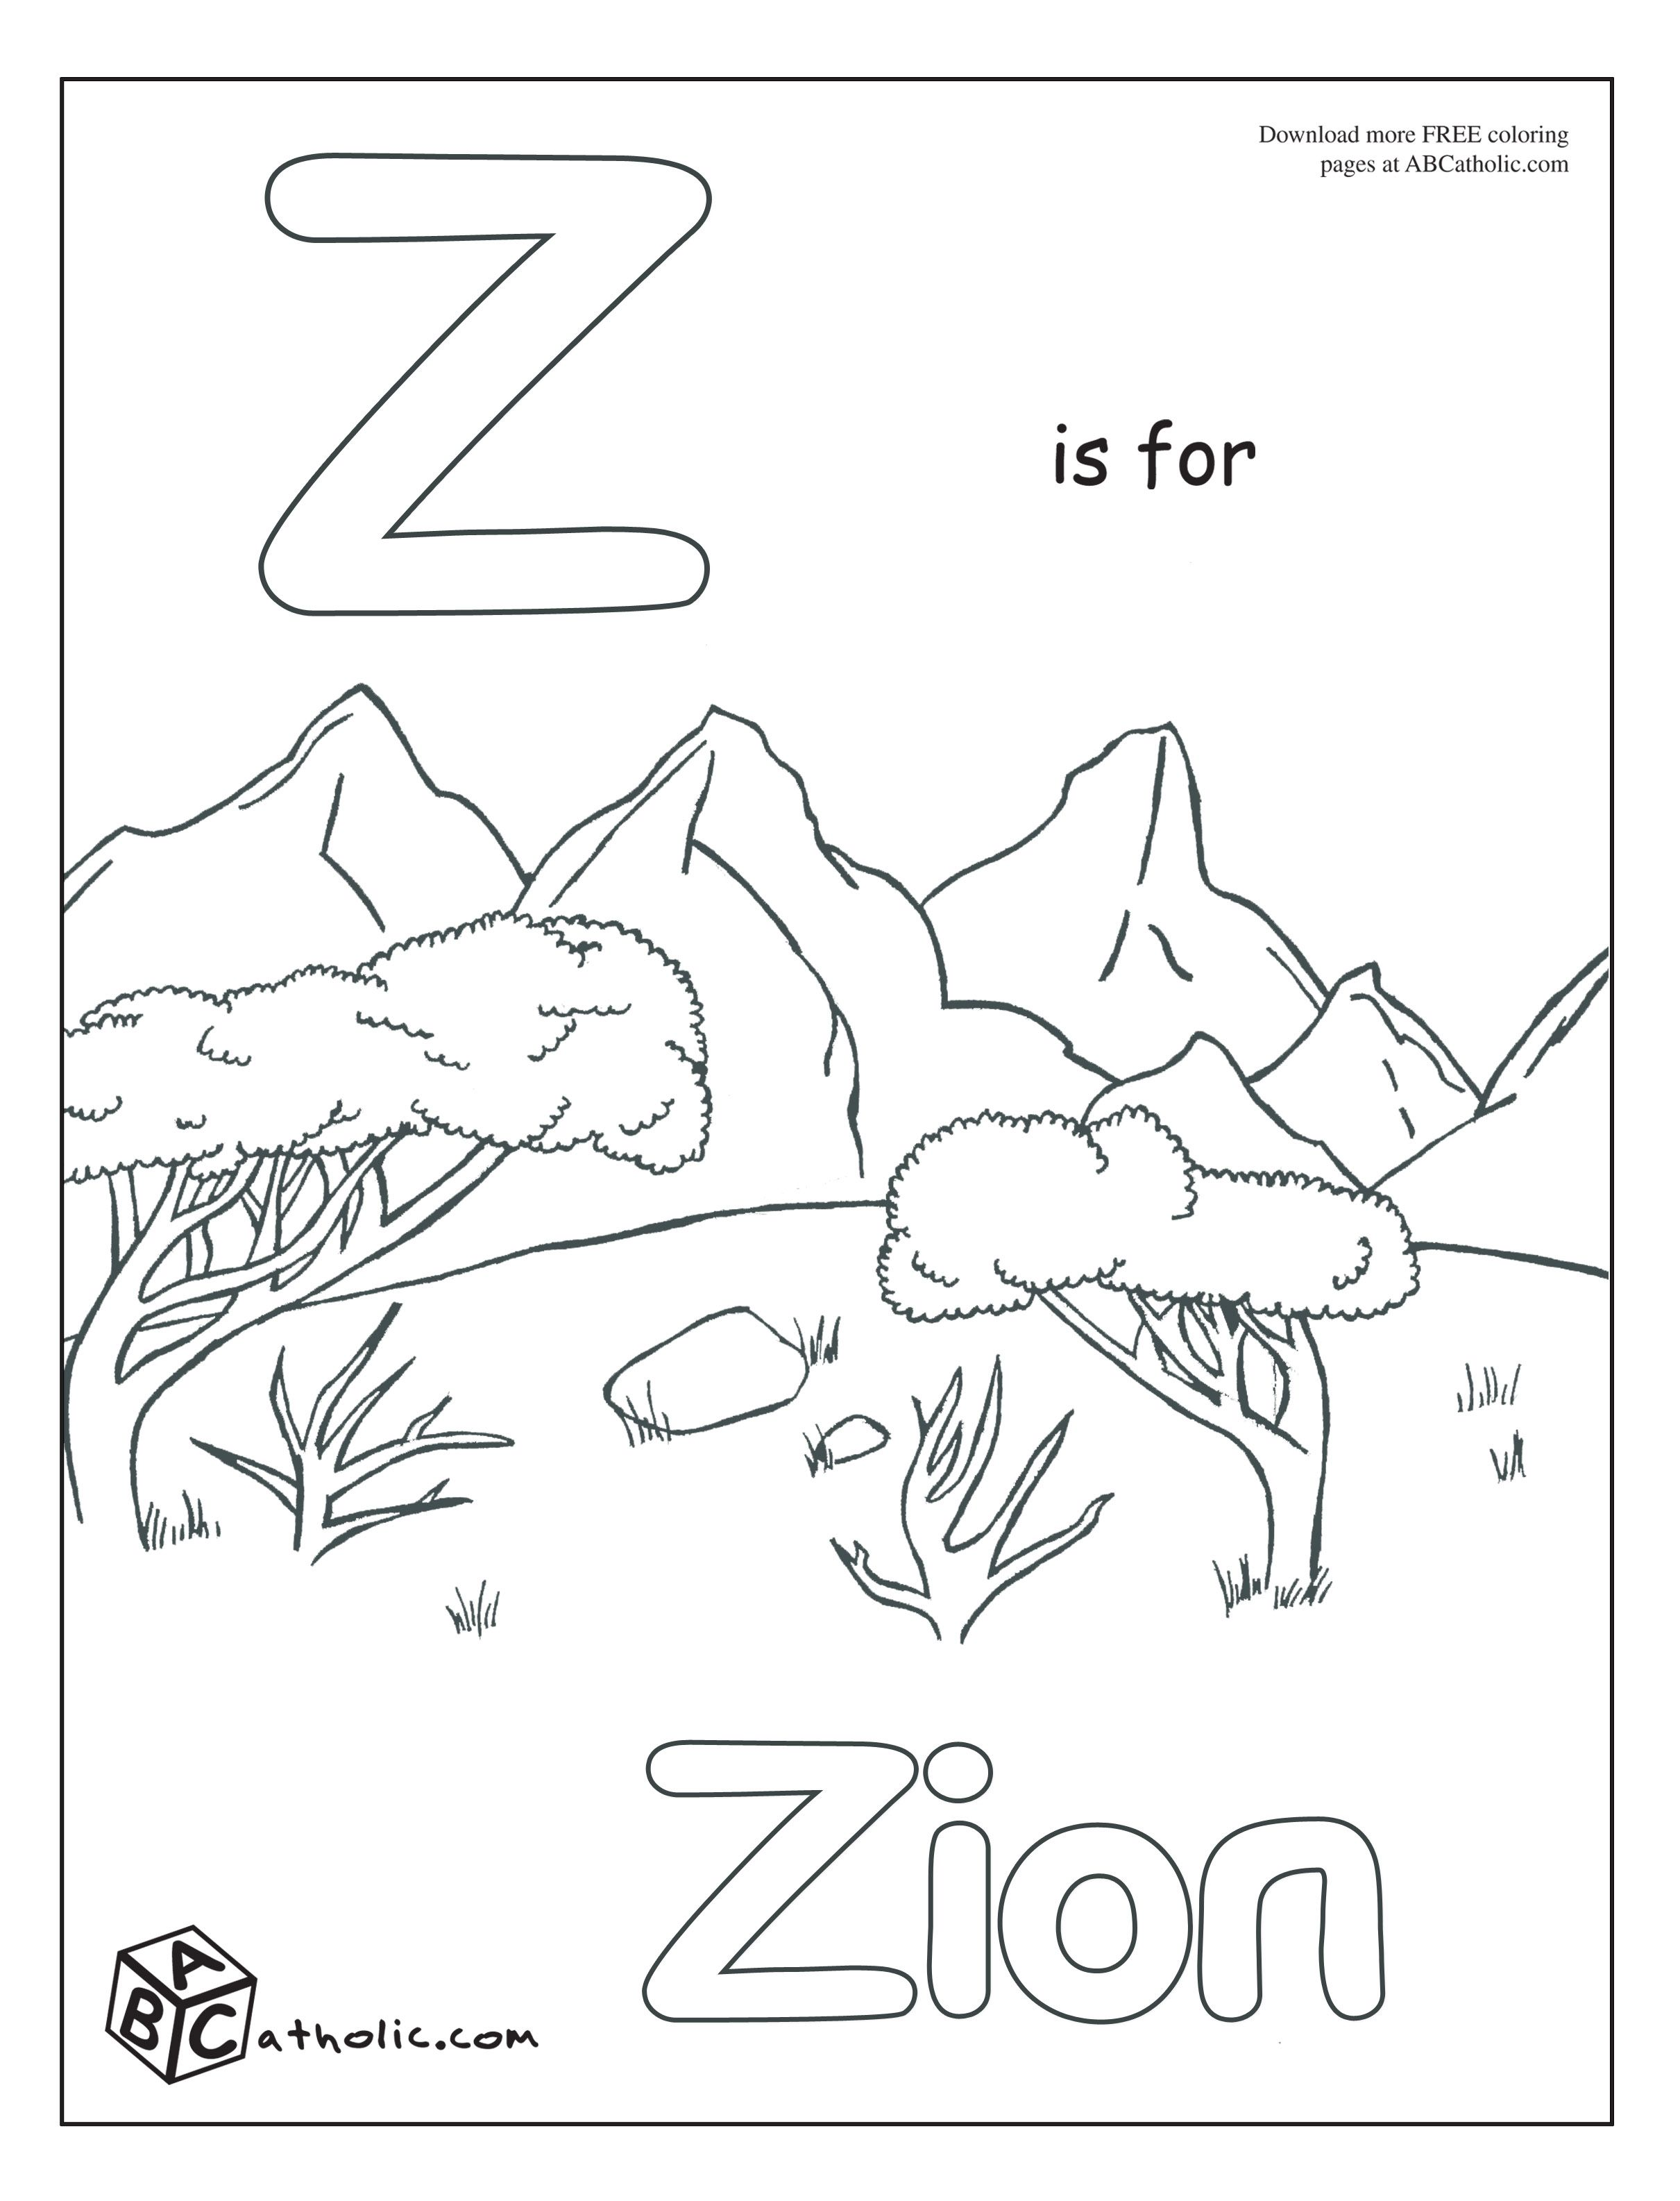 ABC Catholic...Catholic alphabet coloring pages | Preschool Stuff ...